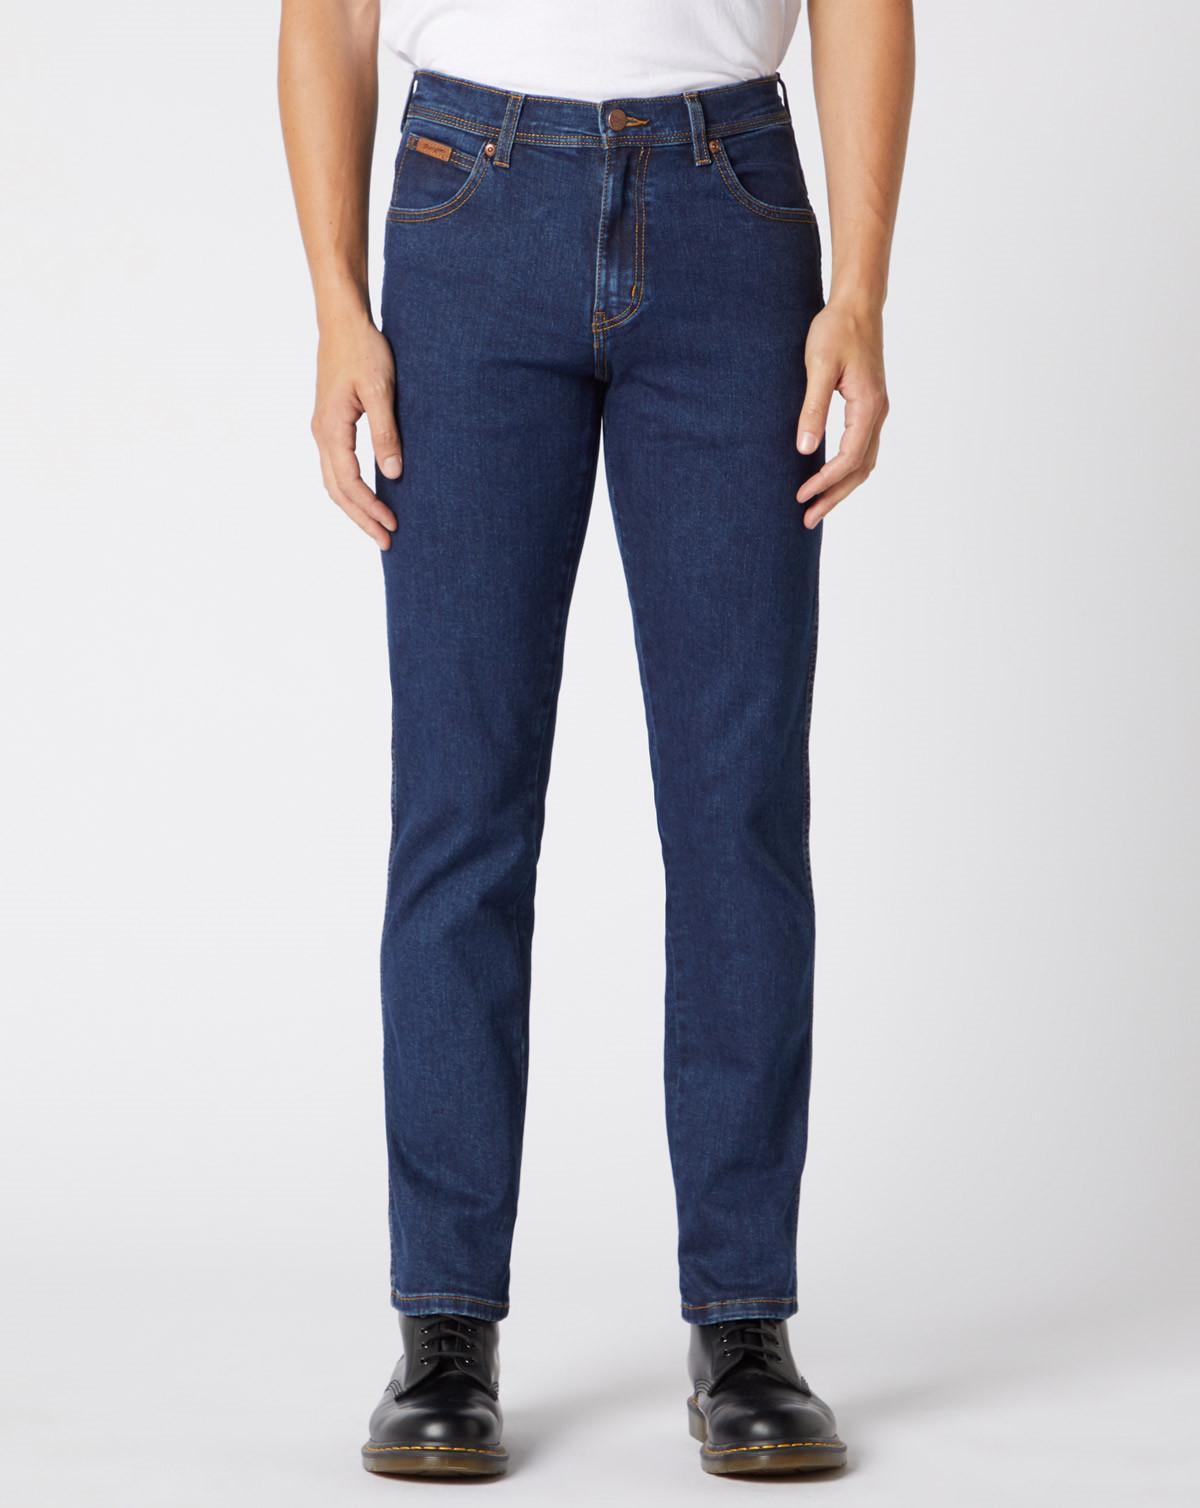 Wrangler Texas Straight Regular Jeans (Darkstone, W40 / L32)